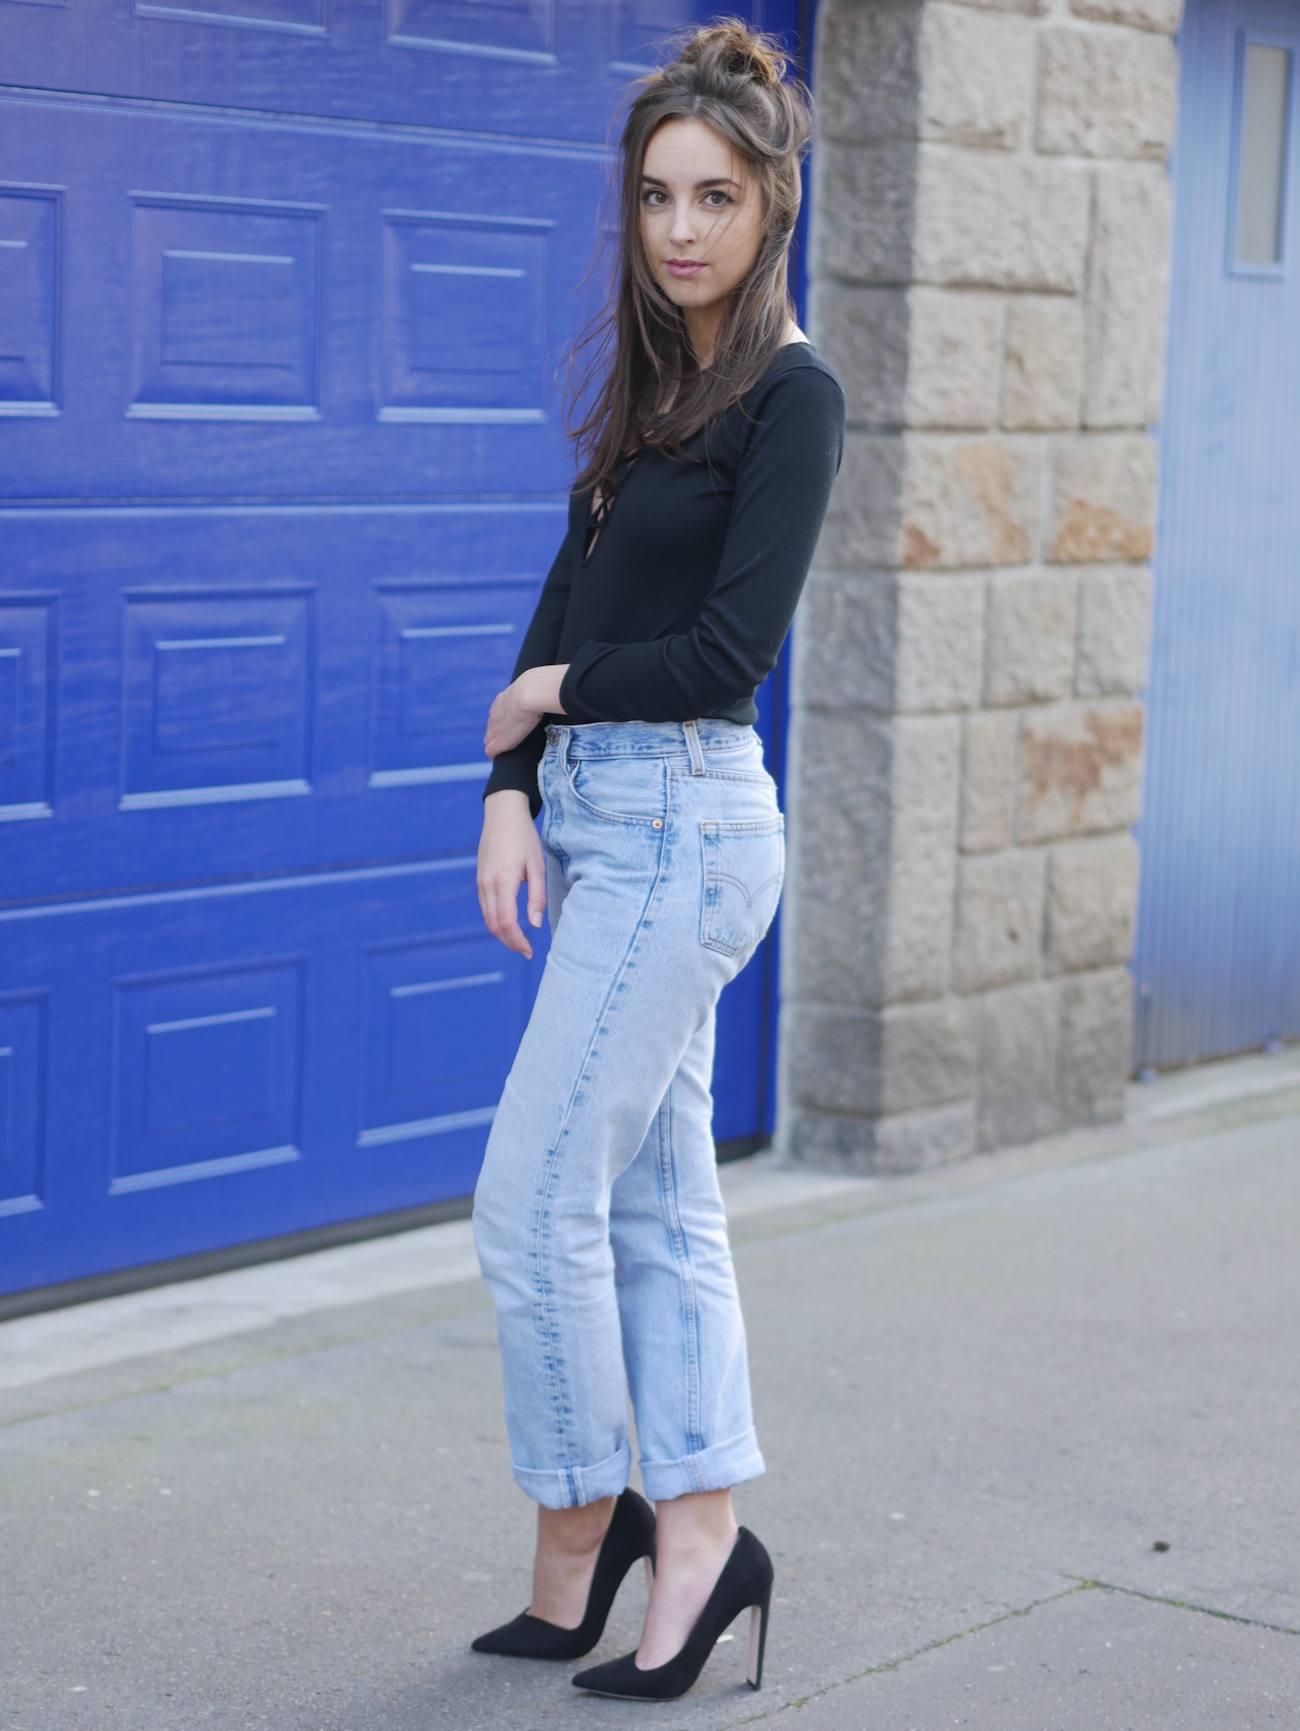 blog nantes - nolwenn c 4